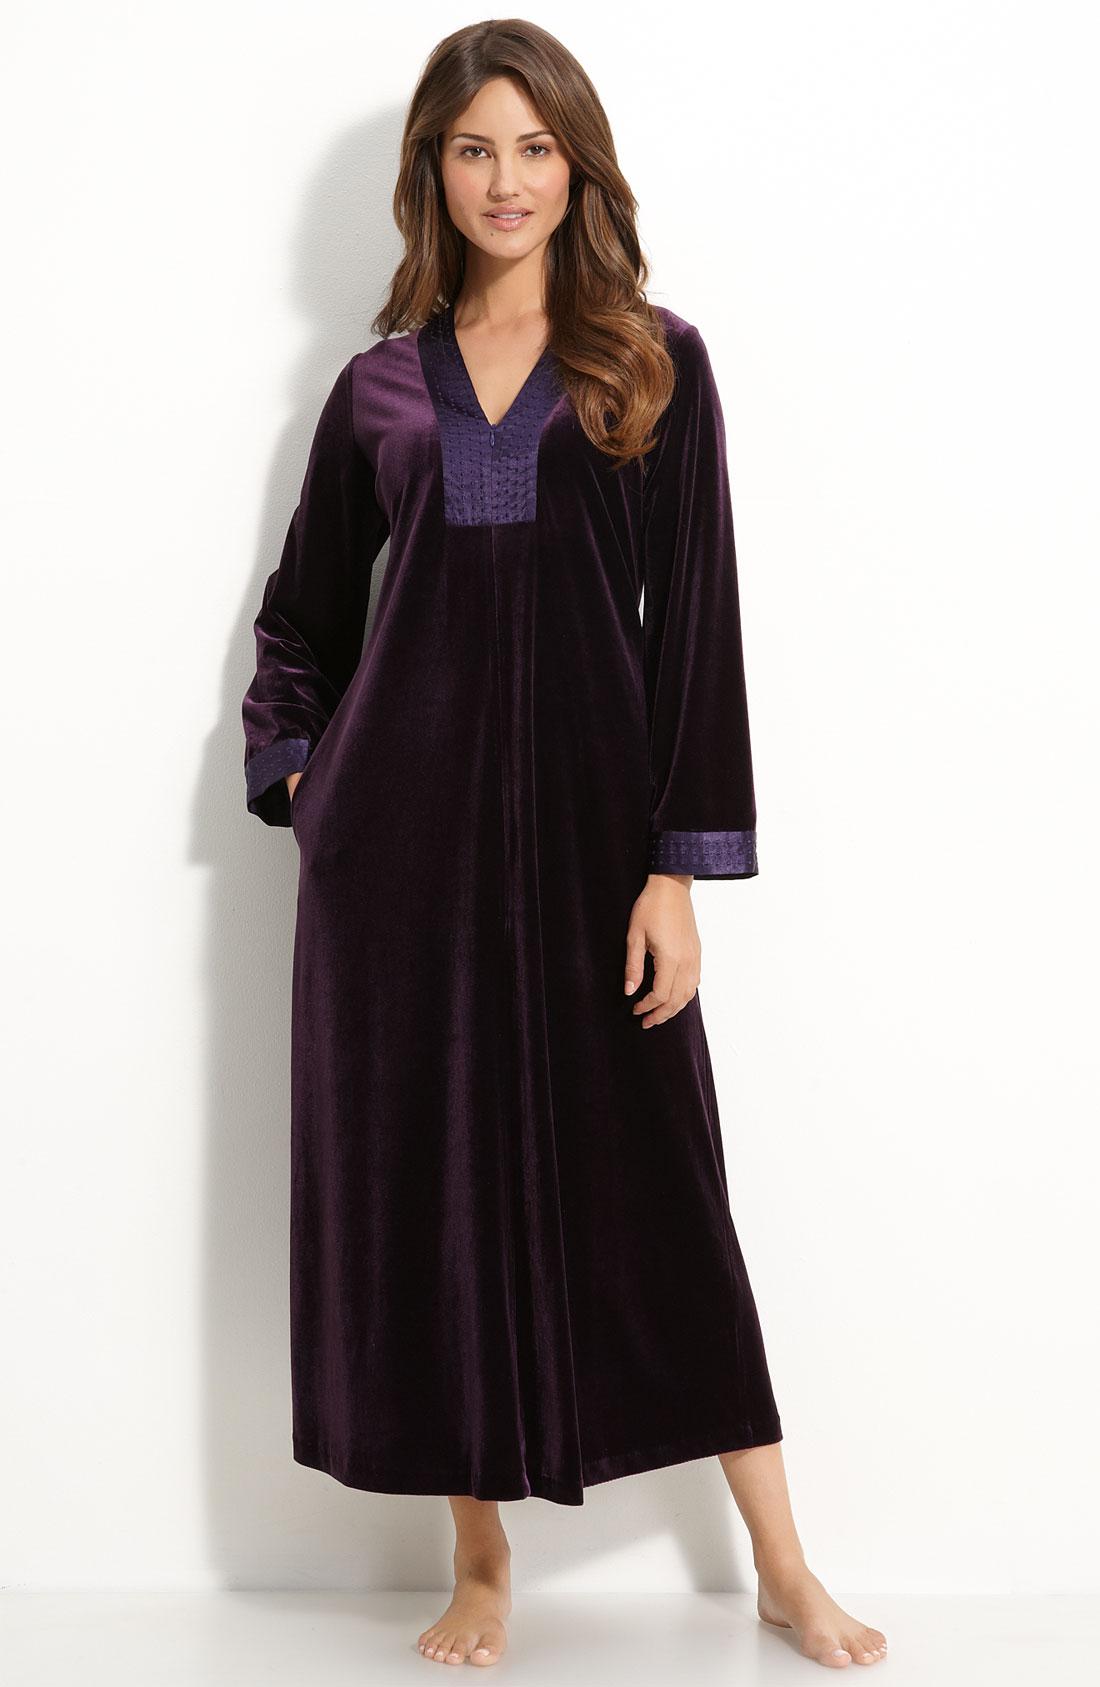 Oscar de la renta zahara nights velvet robe in purple for Robes de mariage de betsey johnson